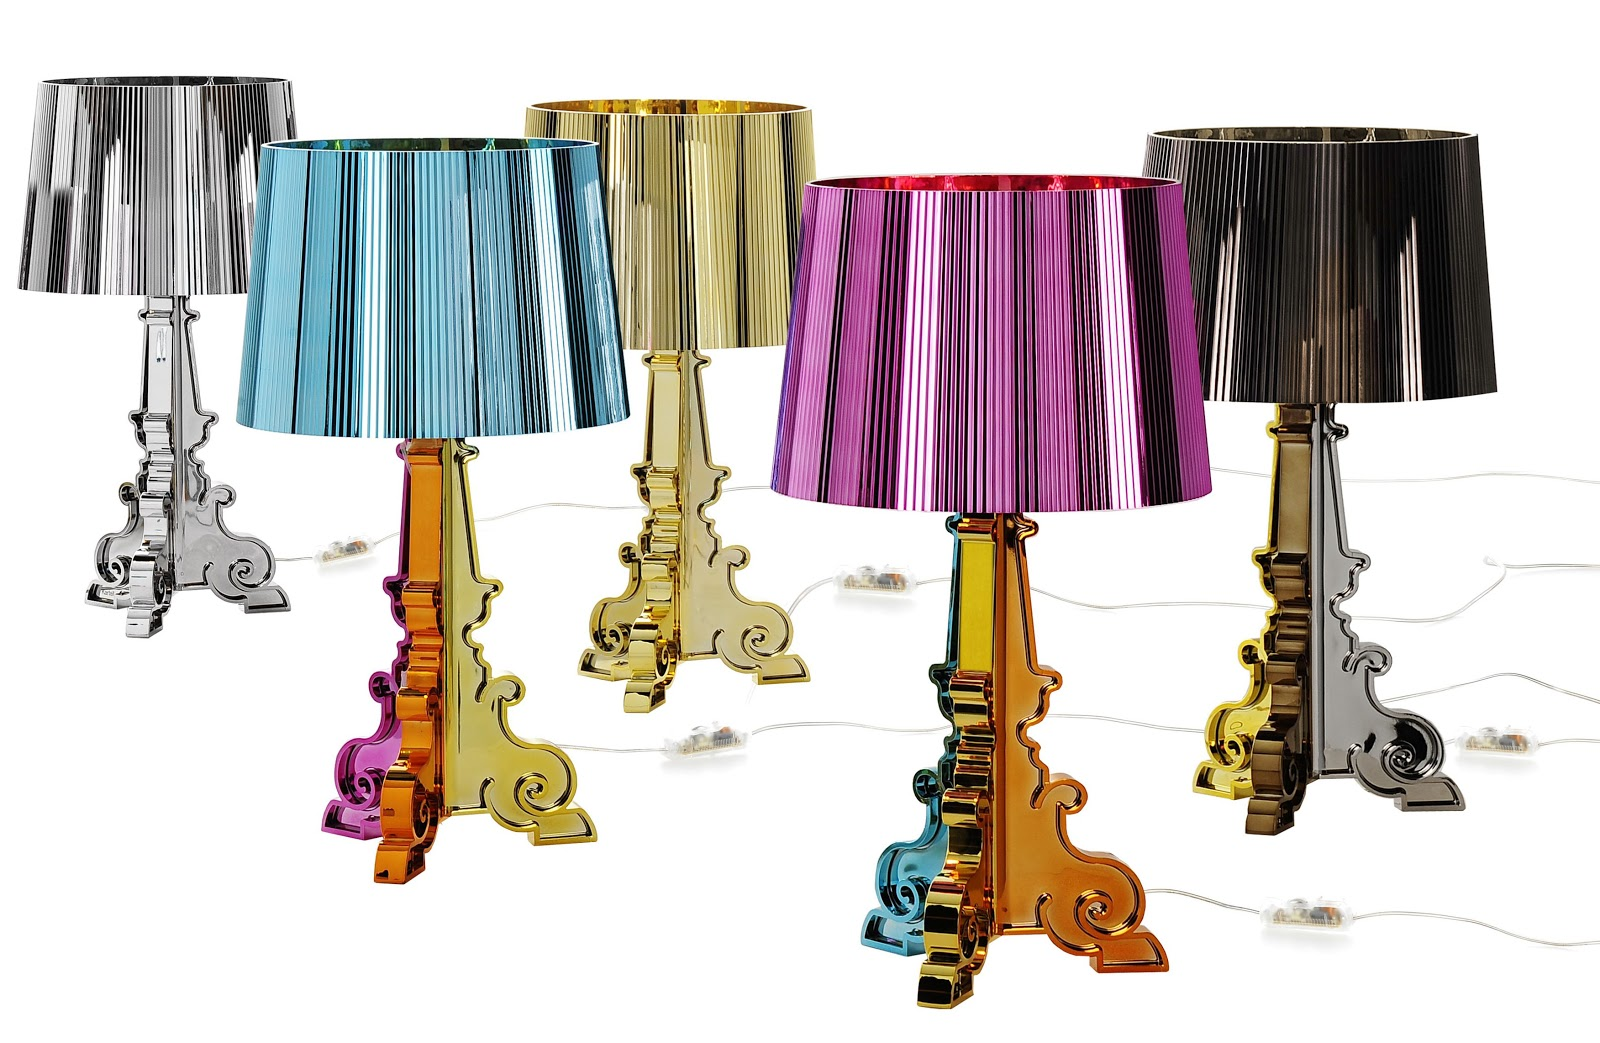 kartell lamps photo - 8